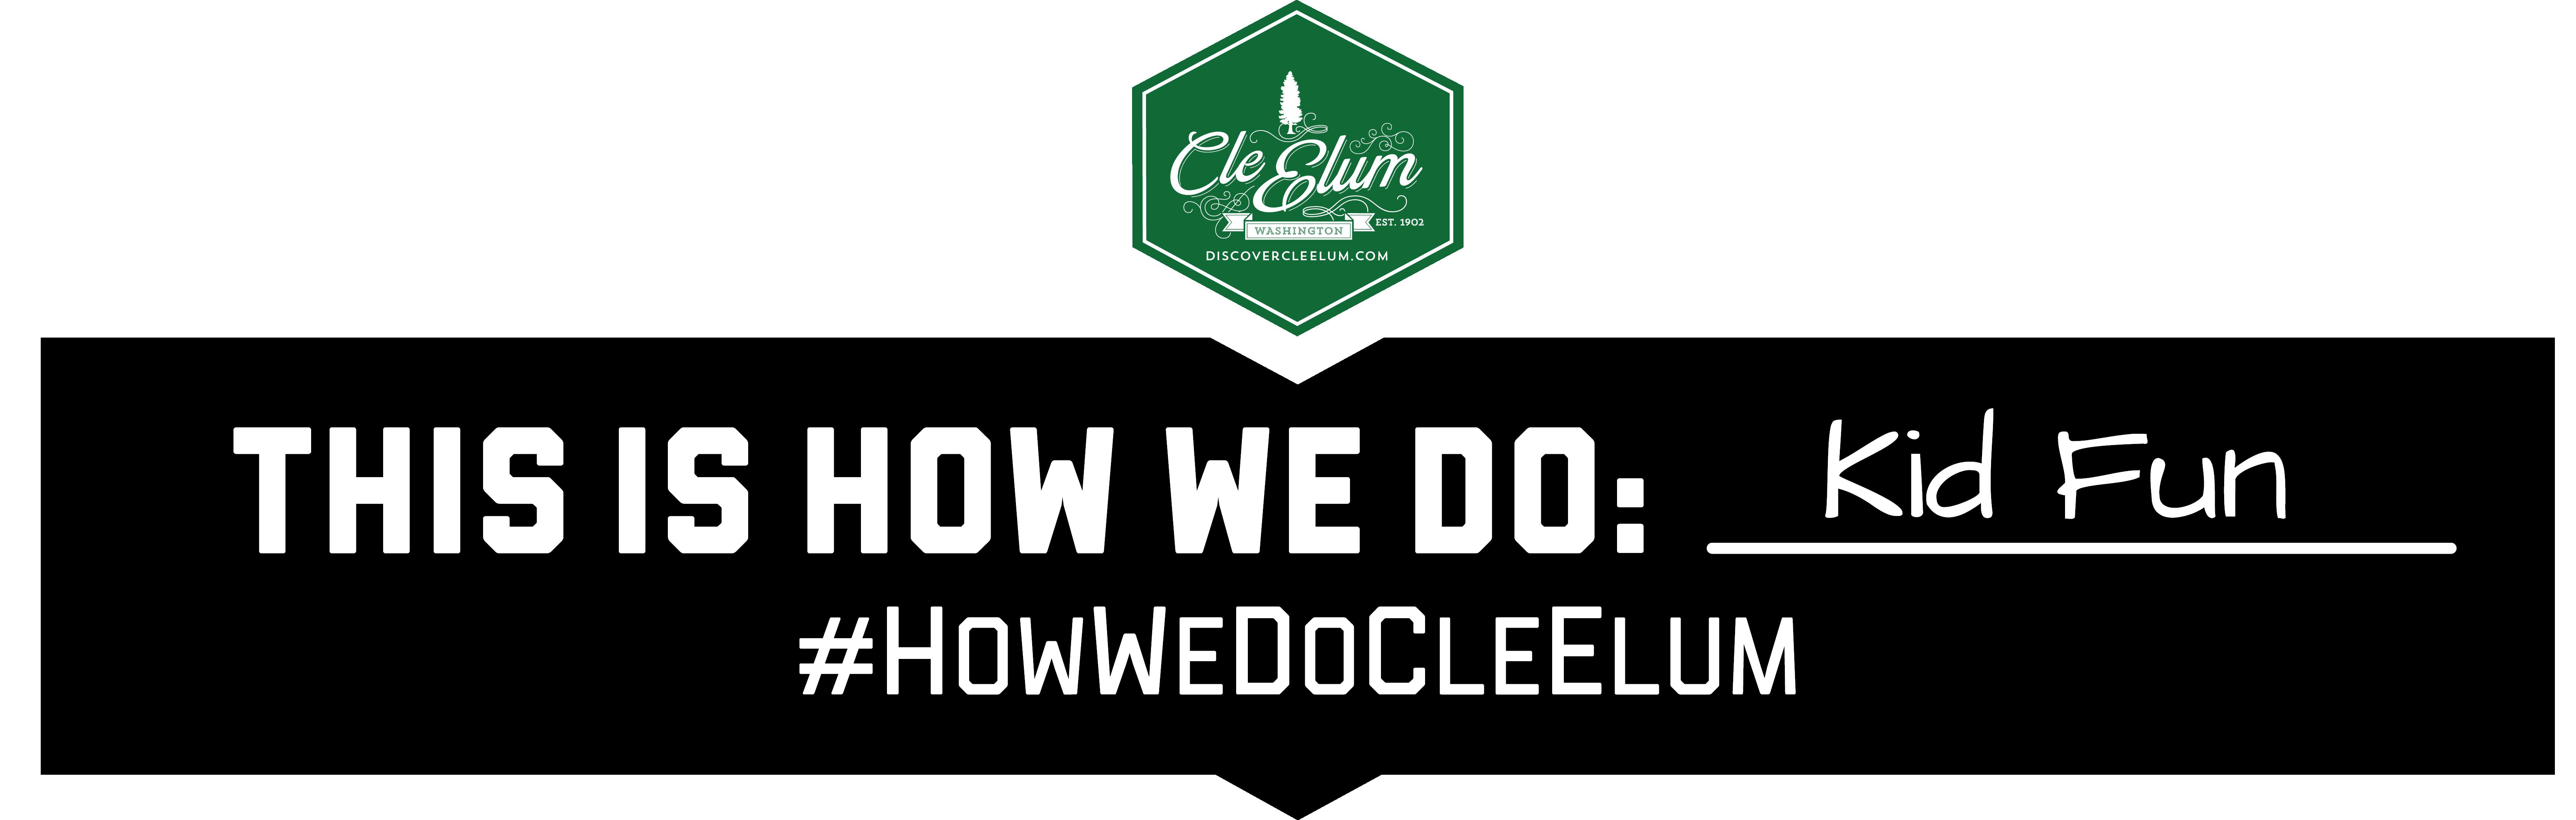 cle,elum,#cleelumrocks